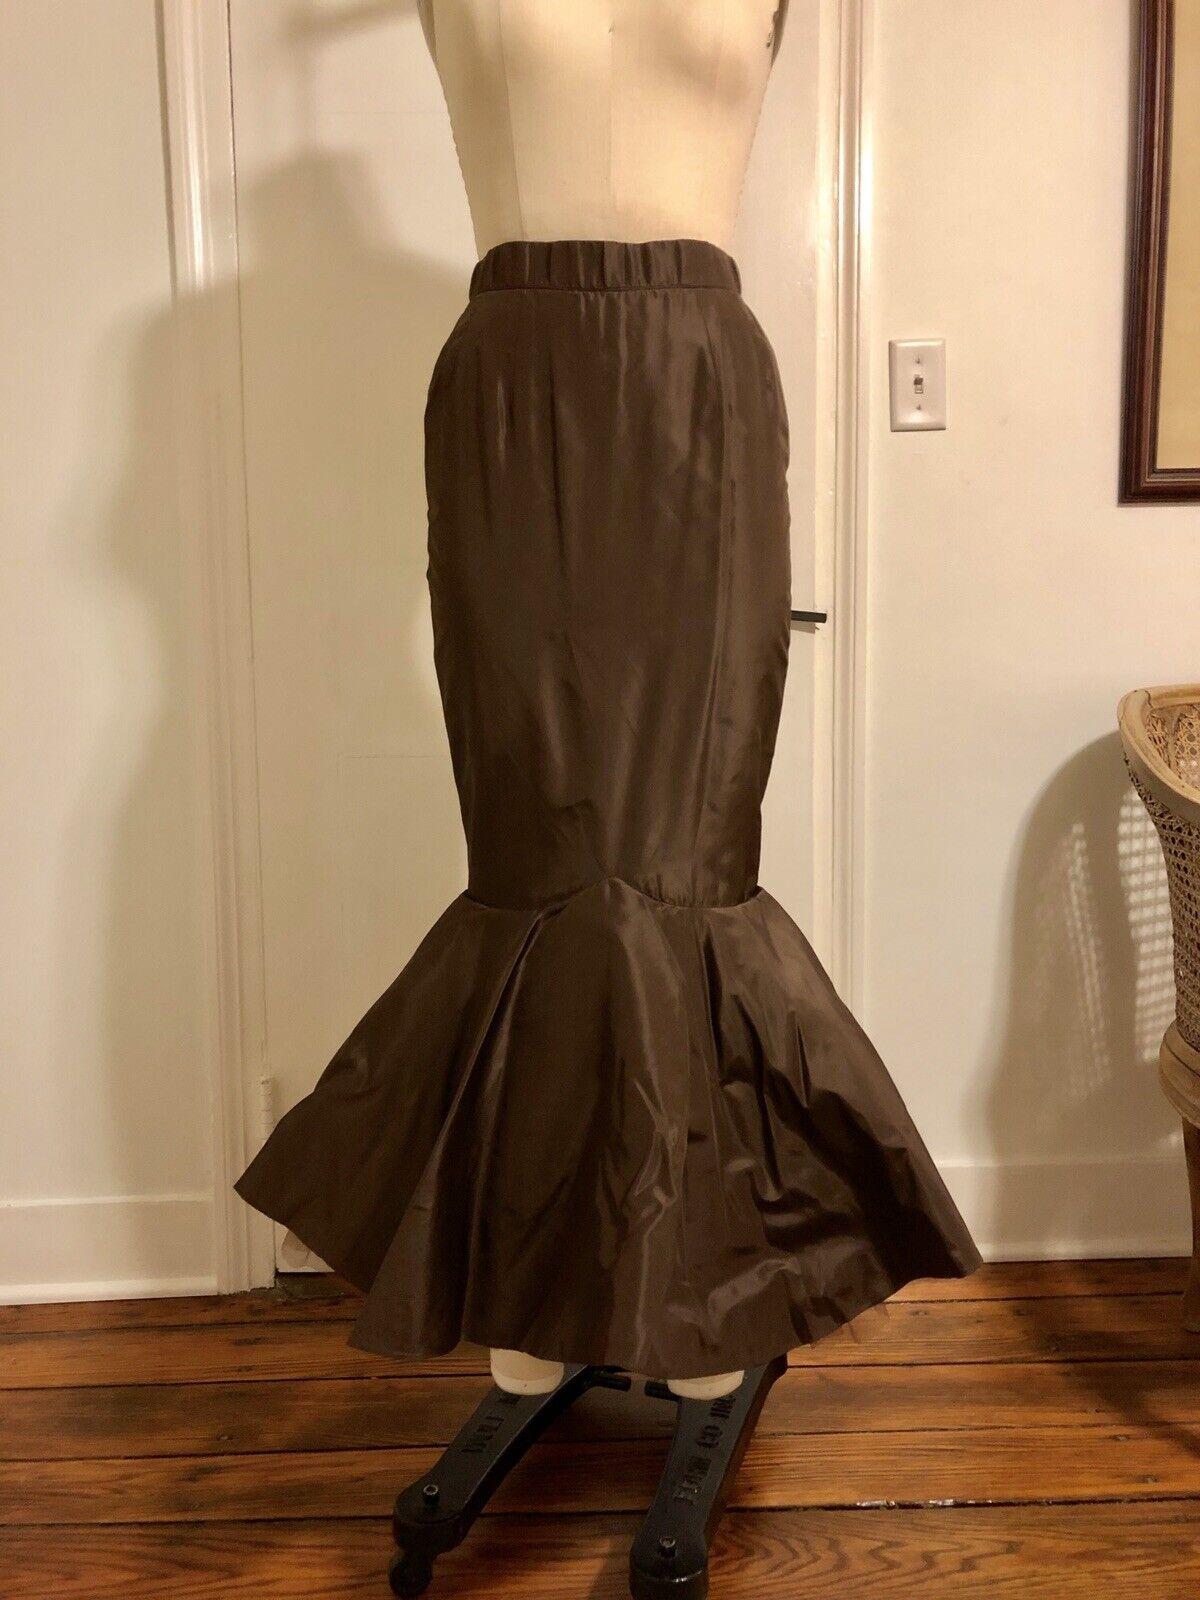 Chocolate Brown Taffeta And Tulle  Mermaid Skirt - Size 2